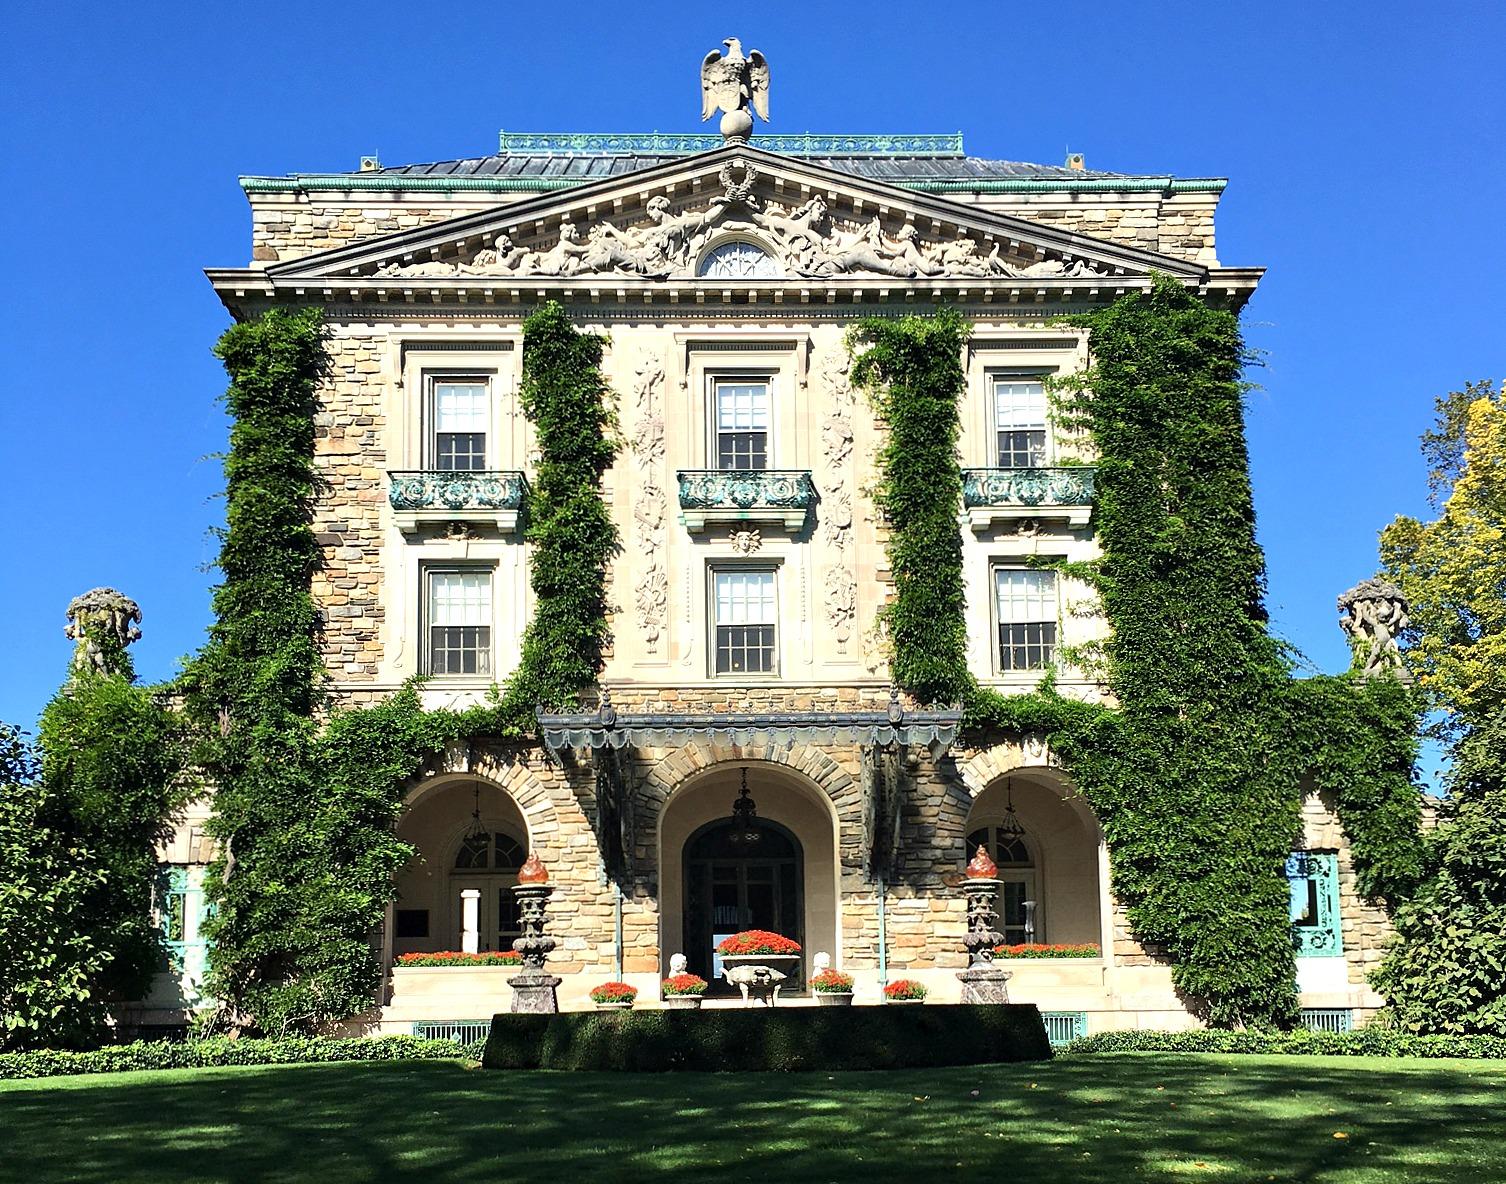 Kykuit, Rockefeller Estate, Tarrytown, Historic Hudson Valley